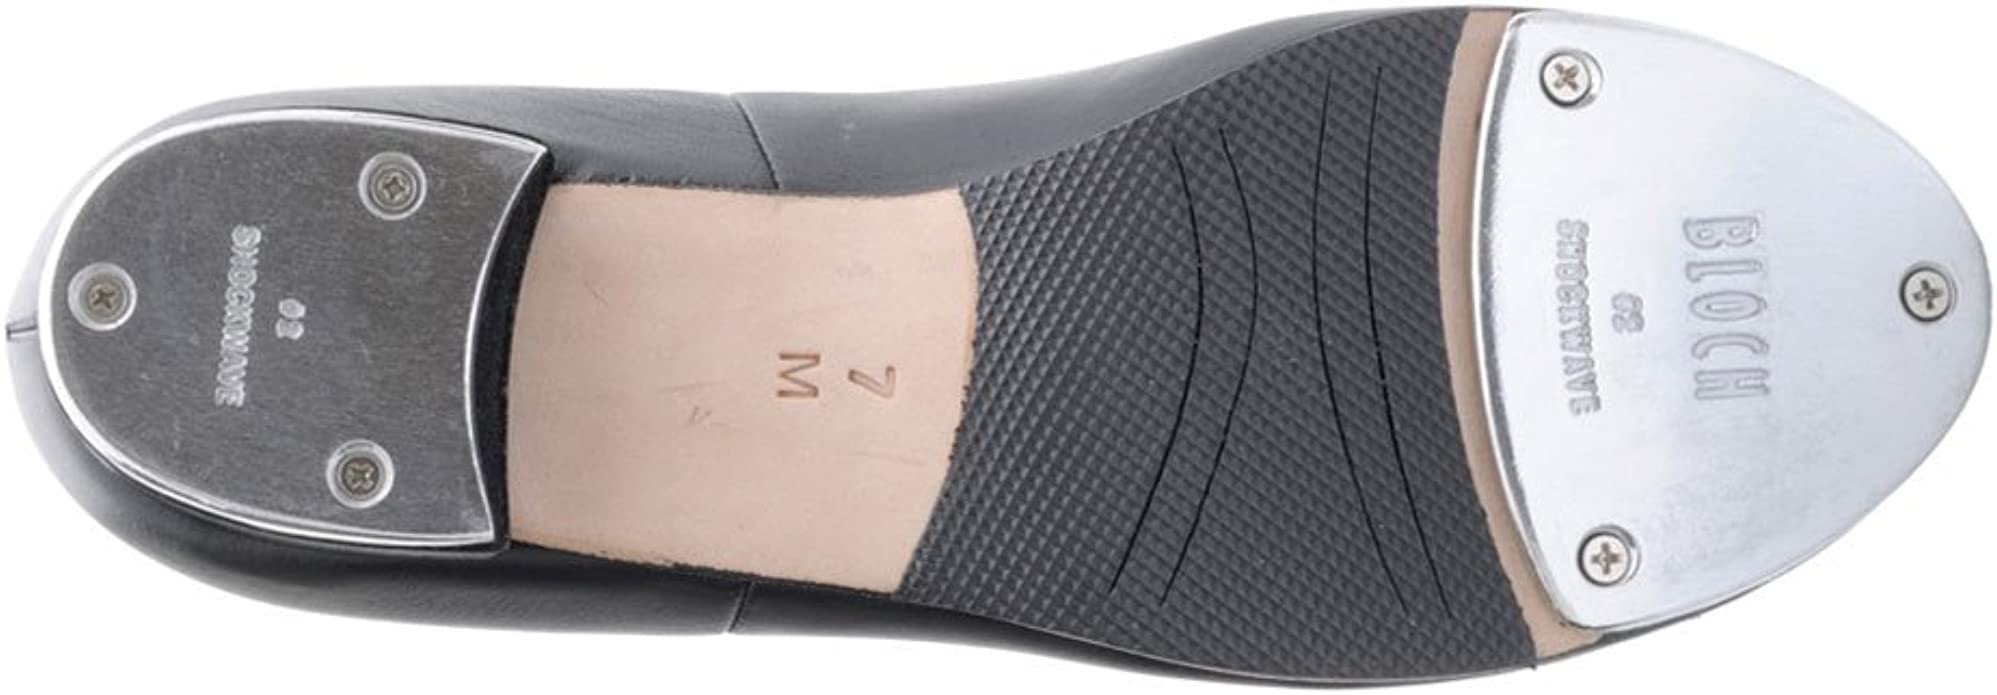 S038lL Leather Tap Shoes Audeo Bloch Tap Shoes